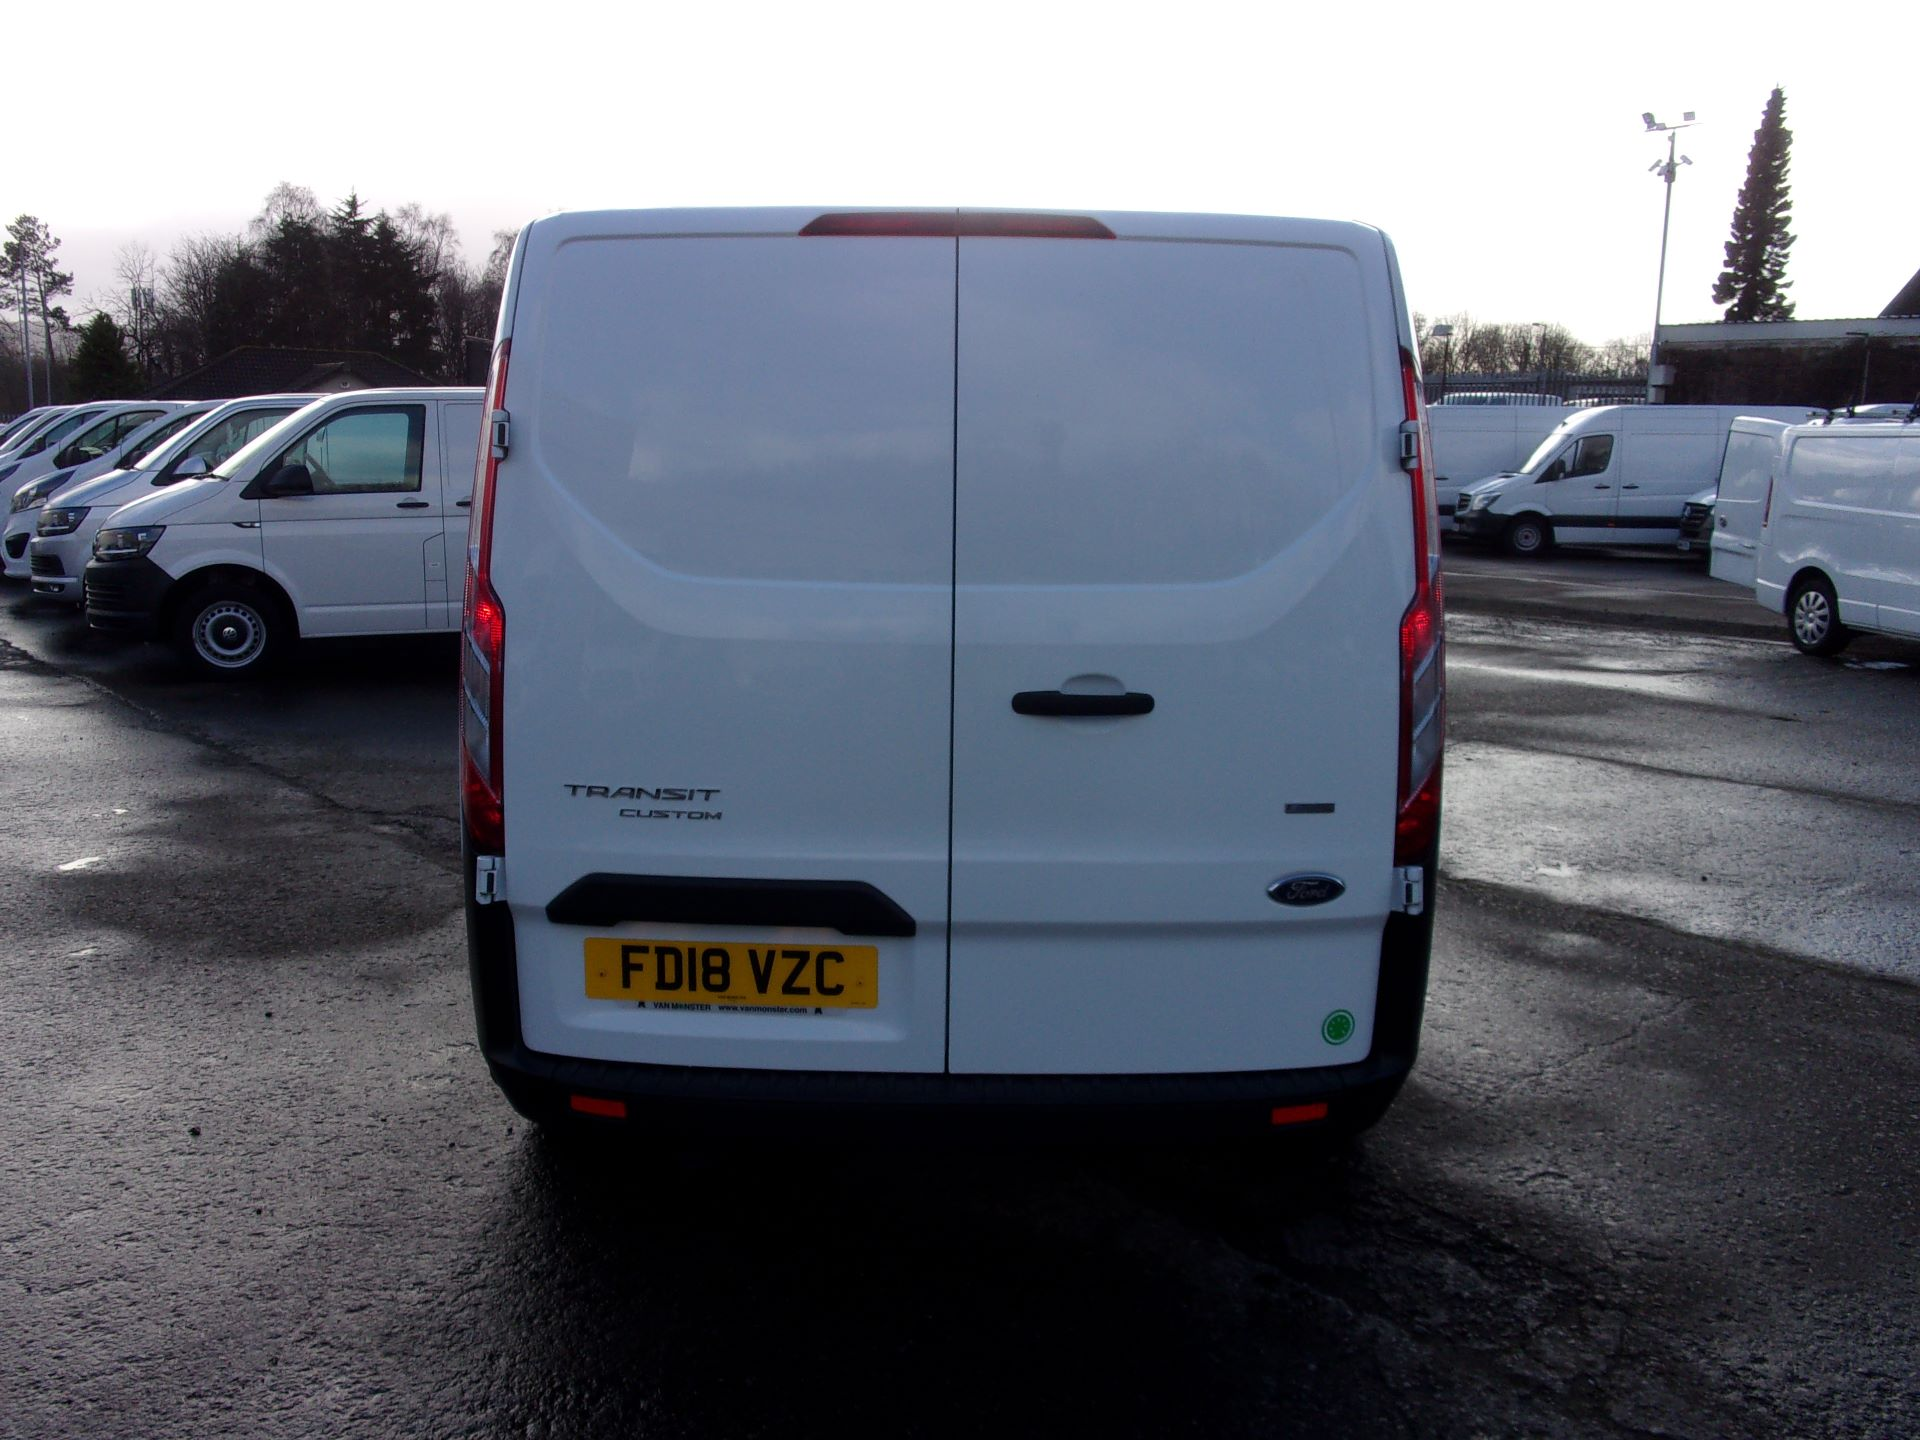 2018 Ford Transit Custom 300 L1 DIESEL FWD 2.0 TDCI 105PS LOW ROOF VAN EURO 6 (FD18VZC) Image 10